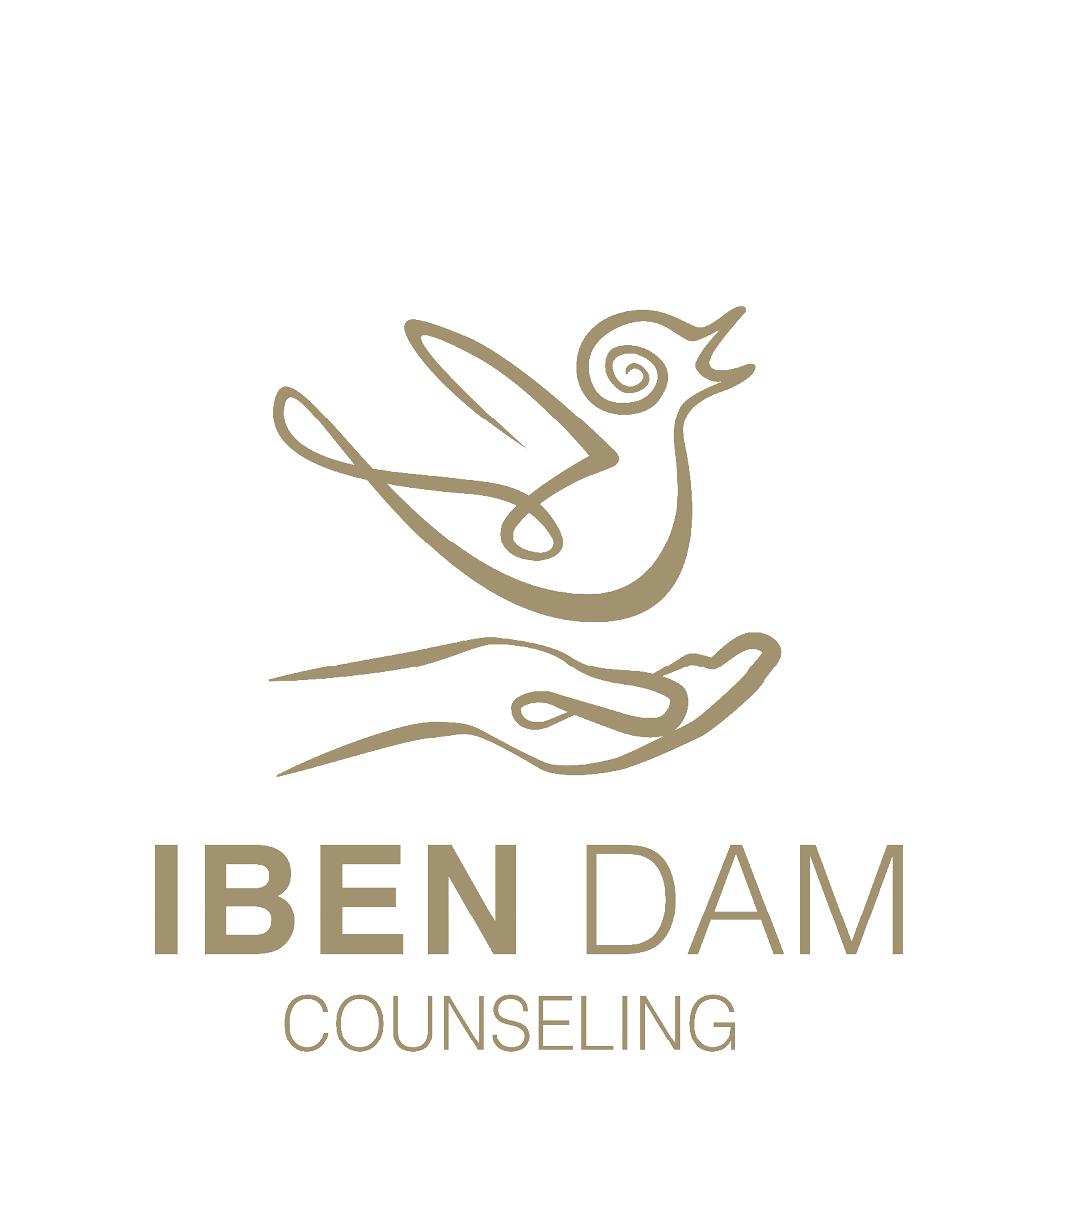 Iben Dam